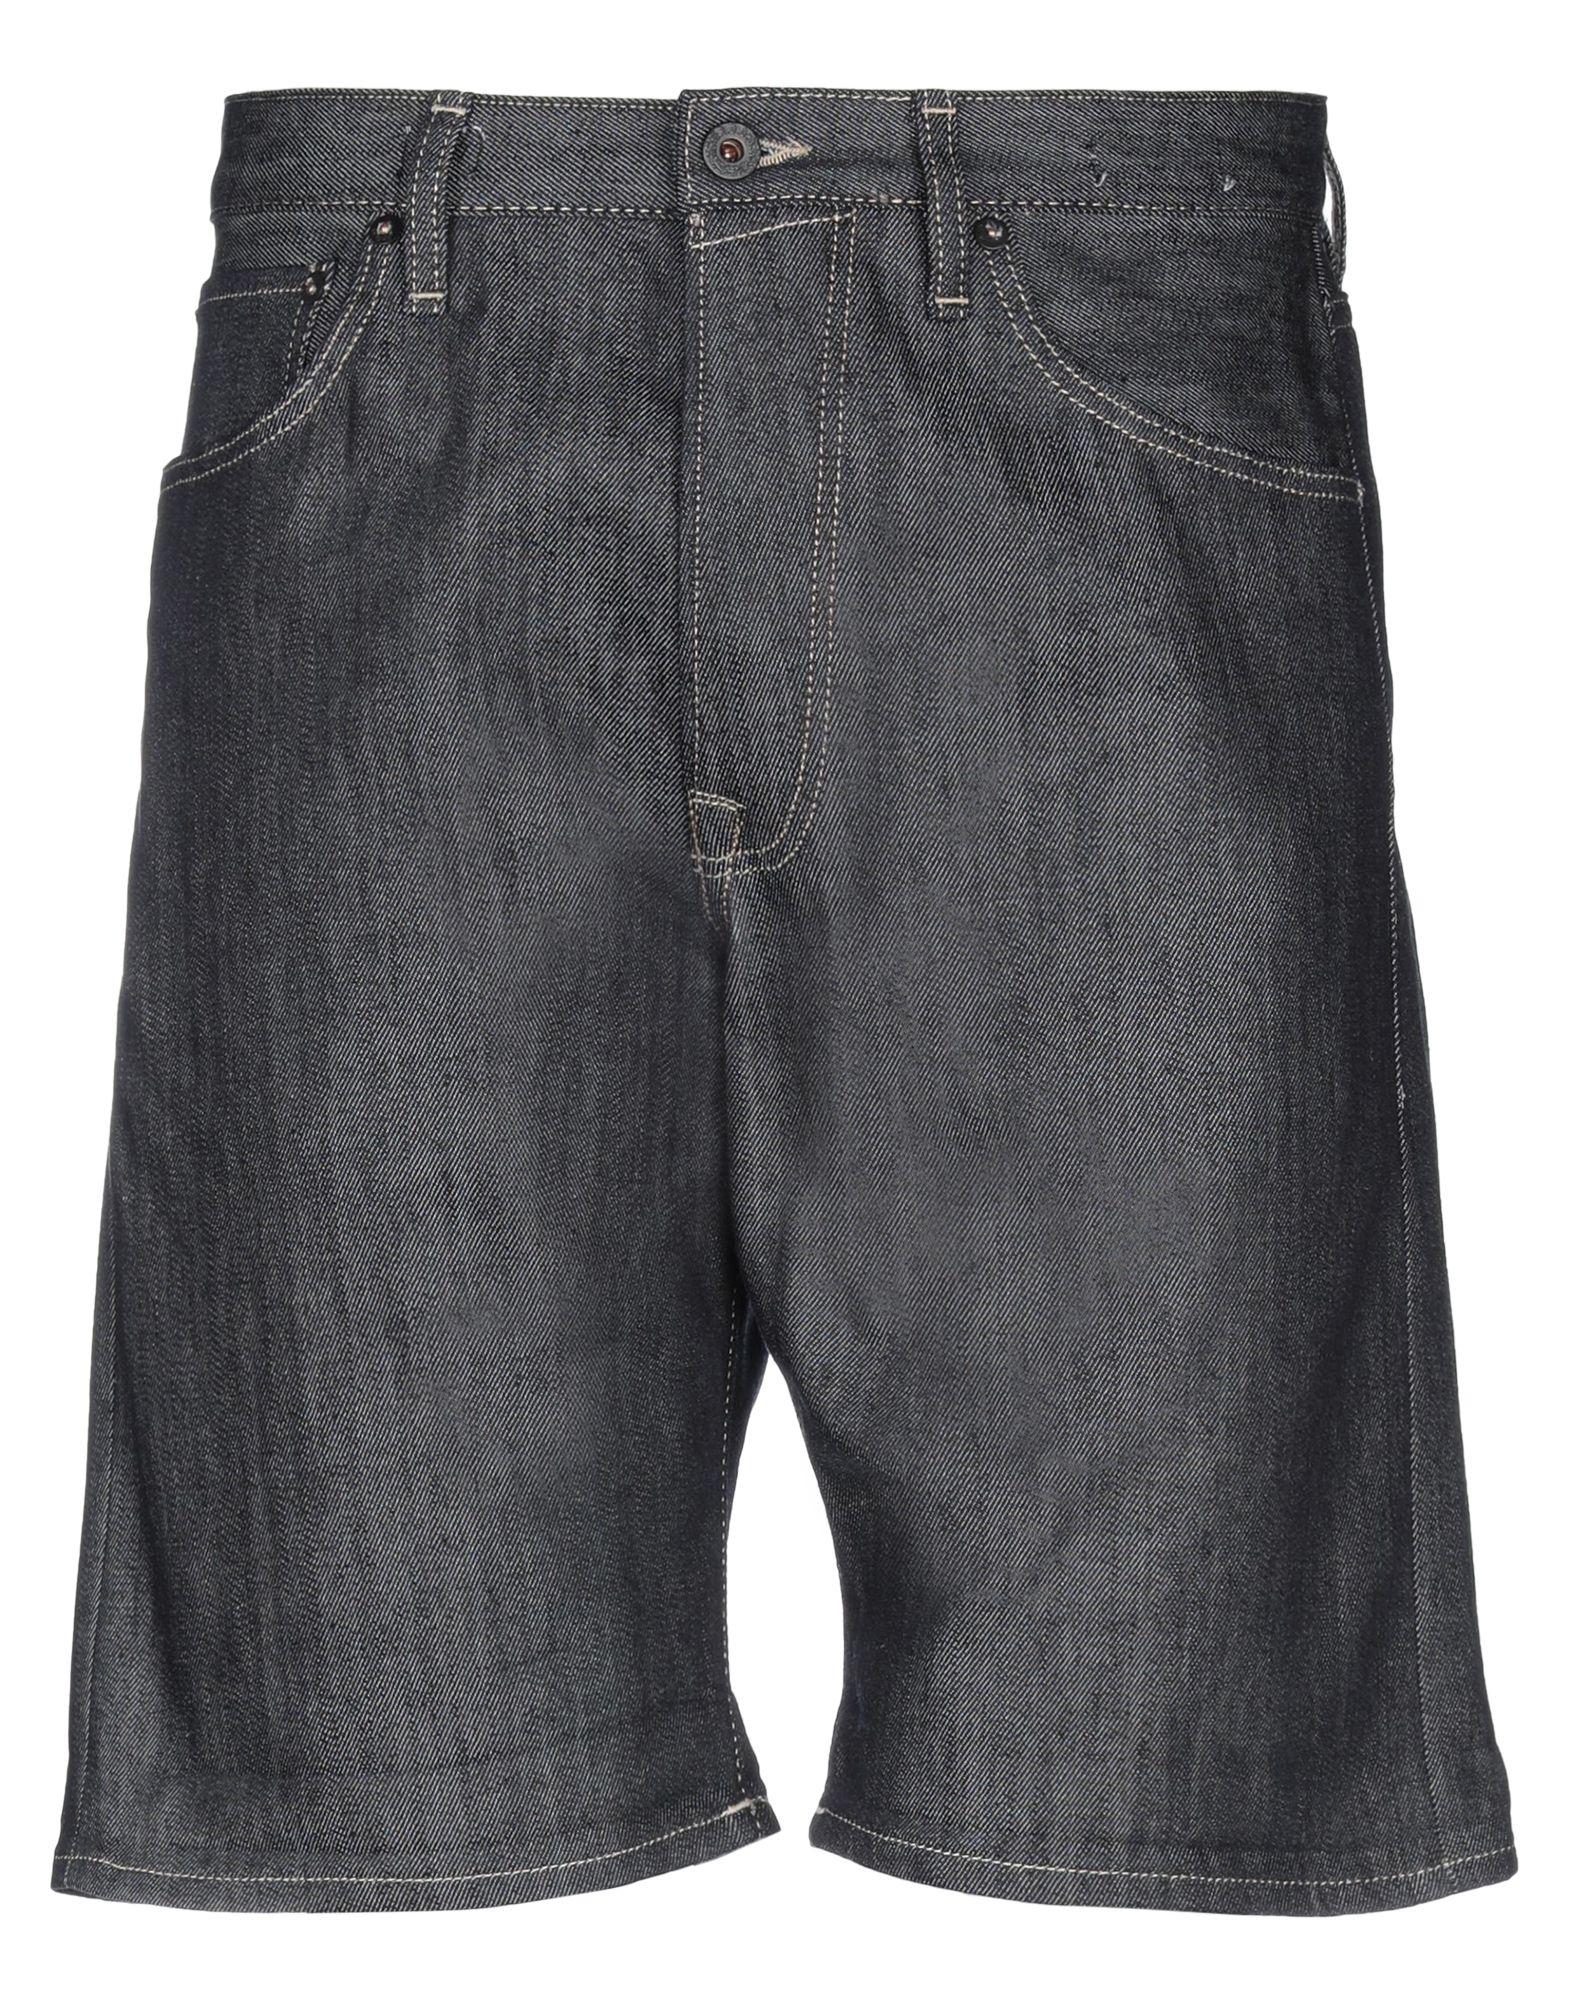 R.D.D. ROYAL DENIM DIVISION BY JACK & JONES Denim shorts - Item 42801938